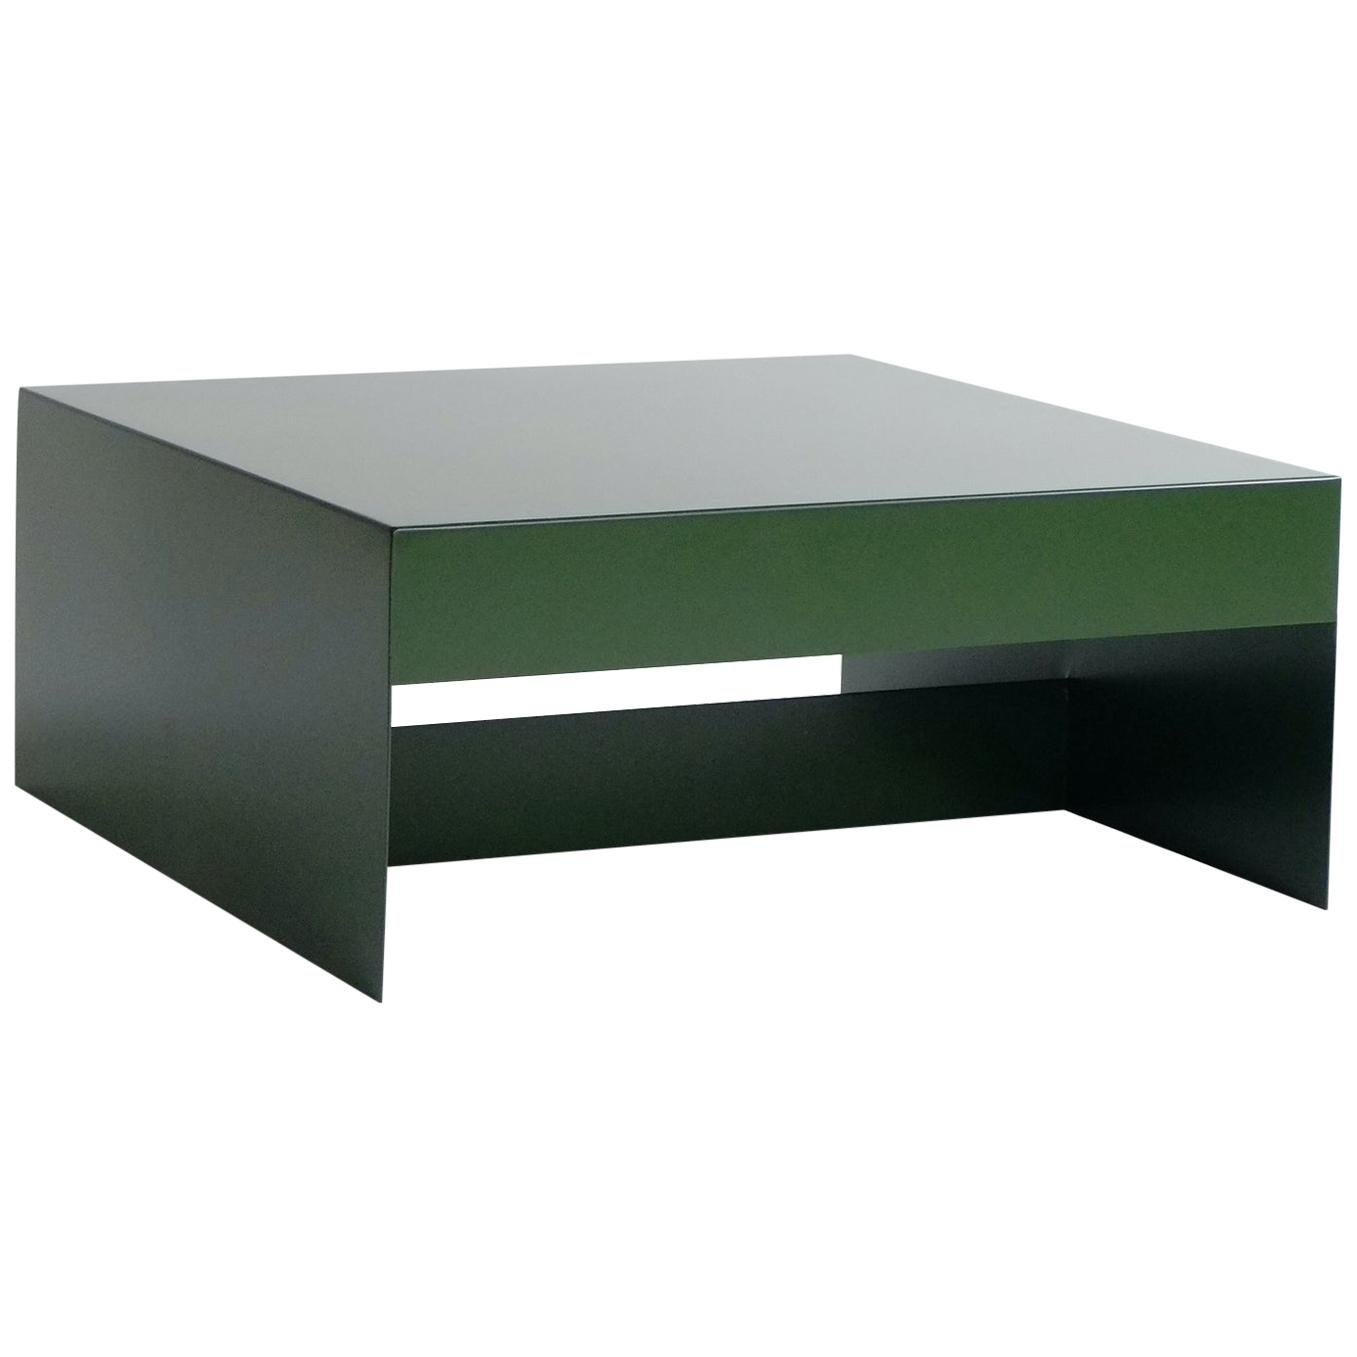 Matt Green, Single Form Square Aluminium Coffee Table, Customisable